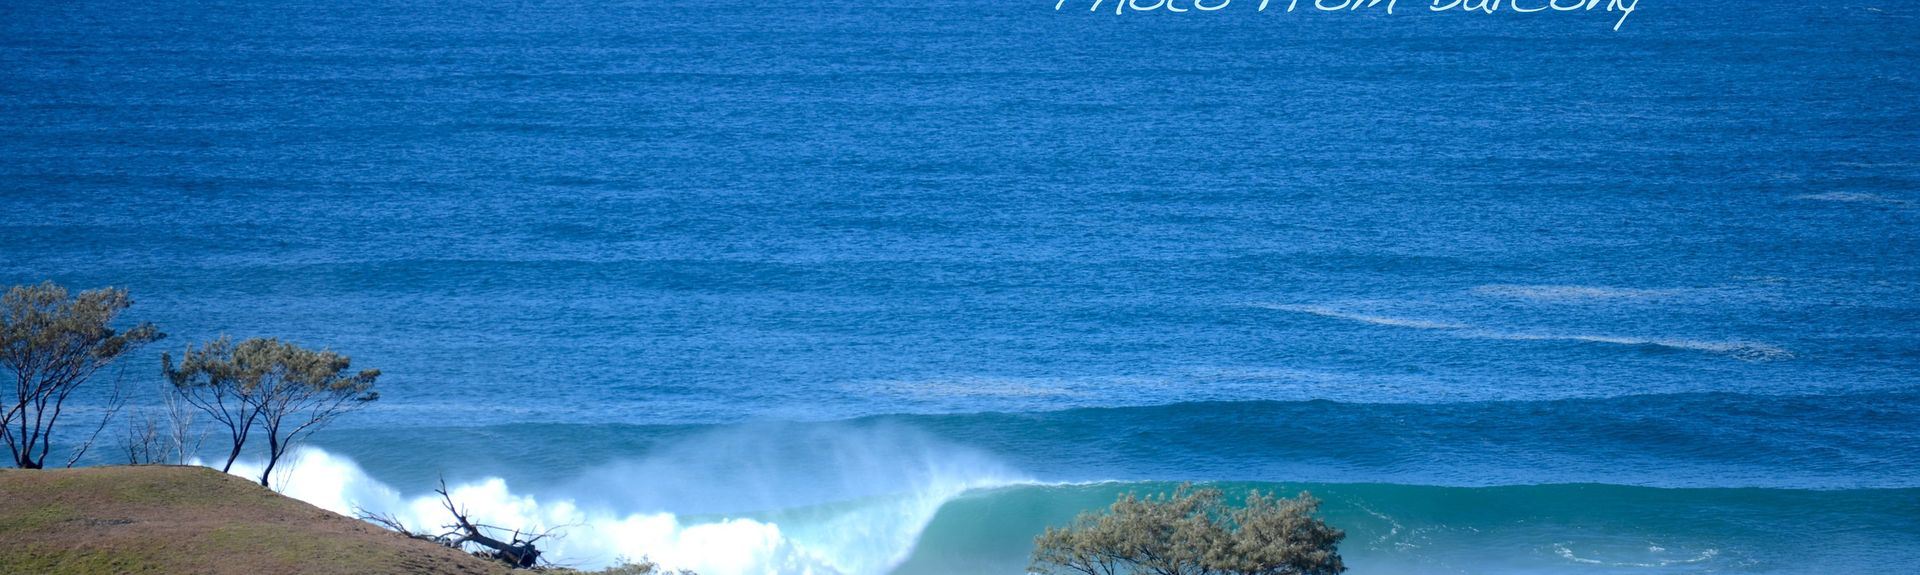 Micalo Island, New South Wales, Australia